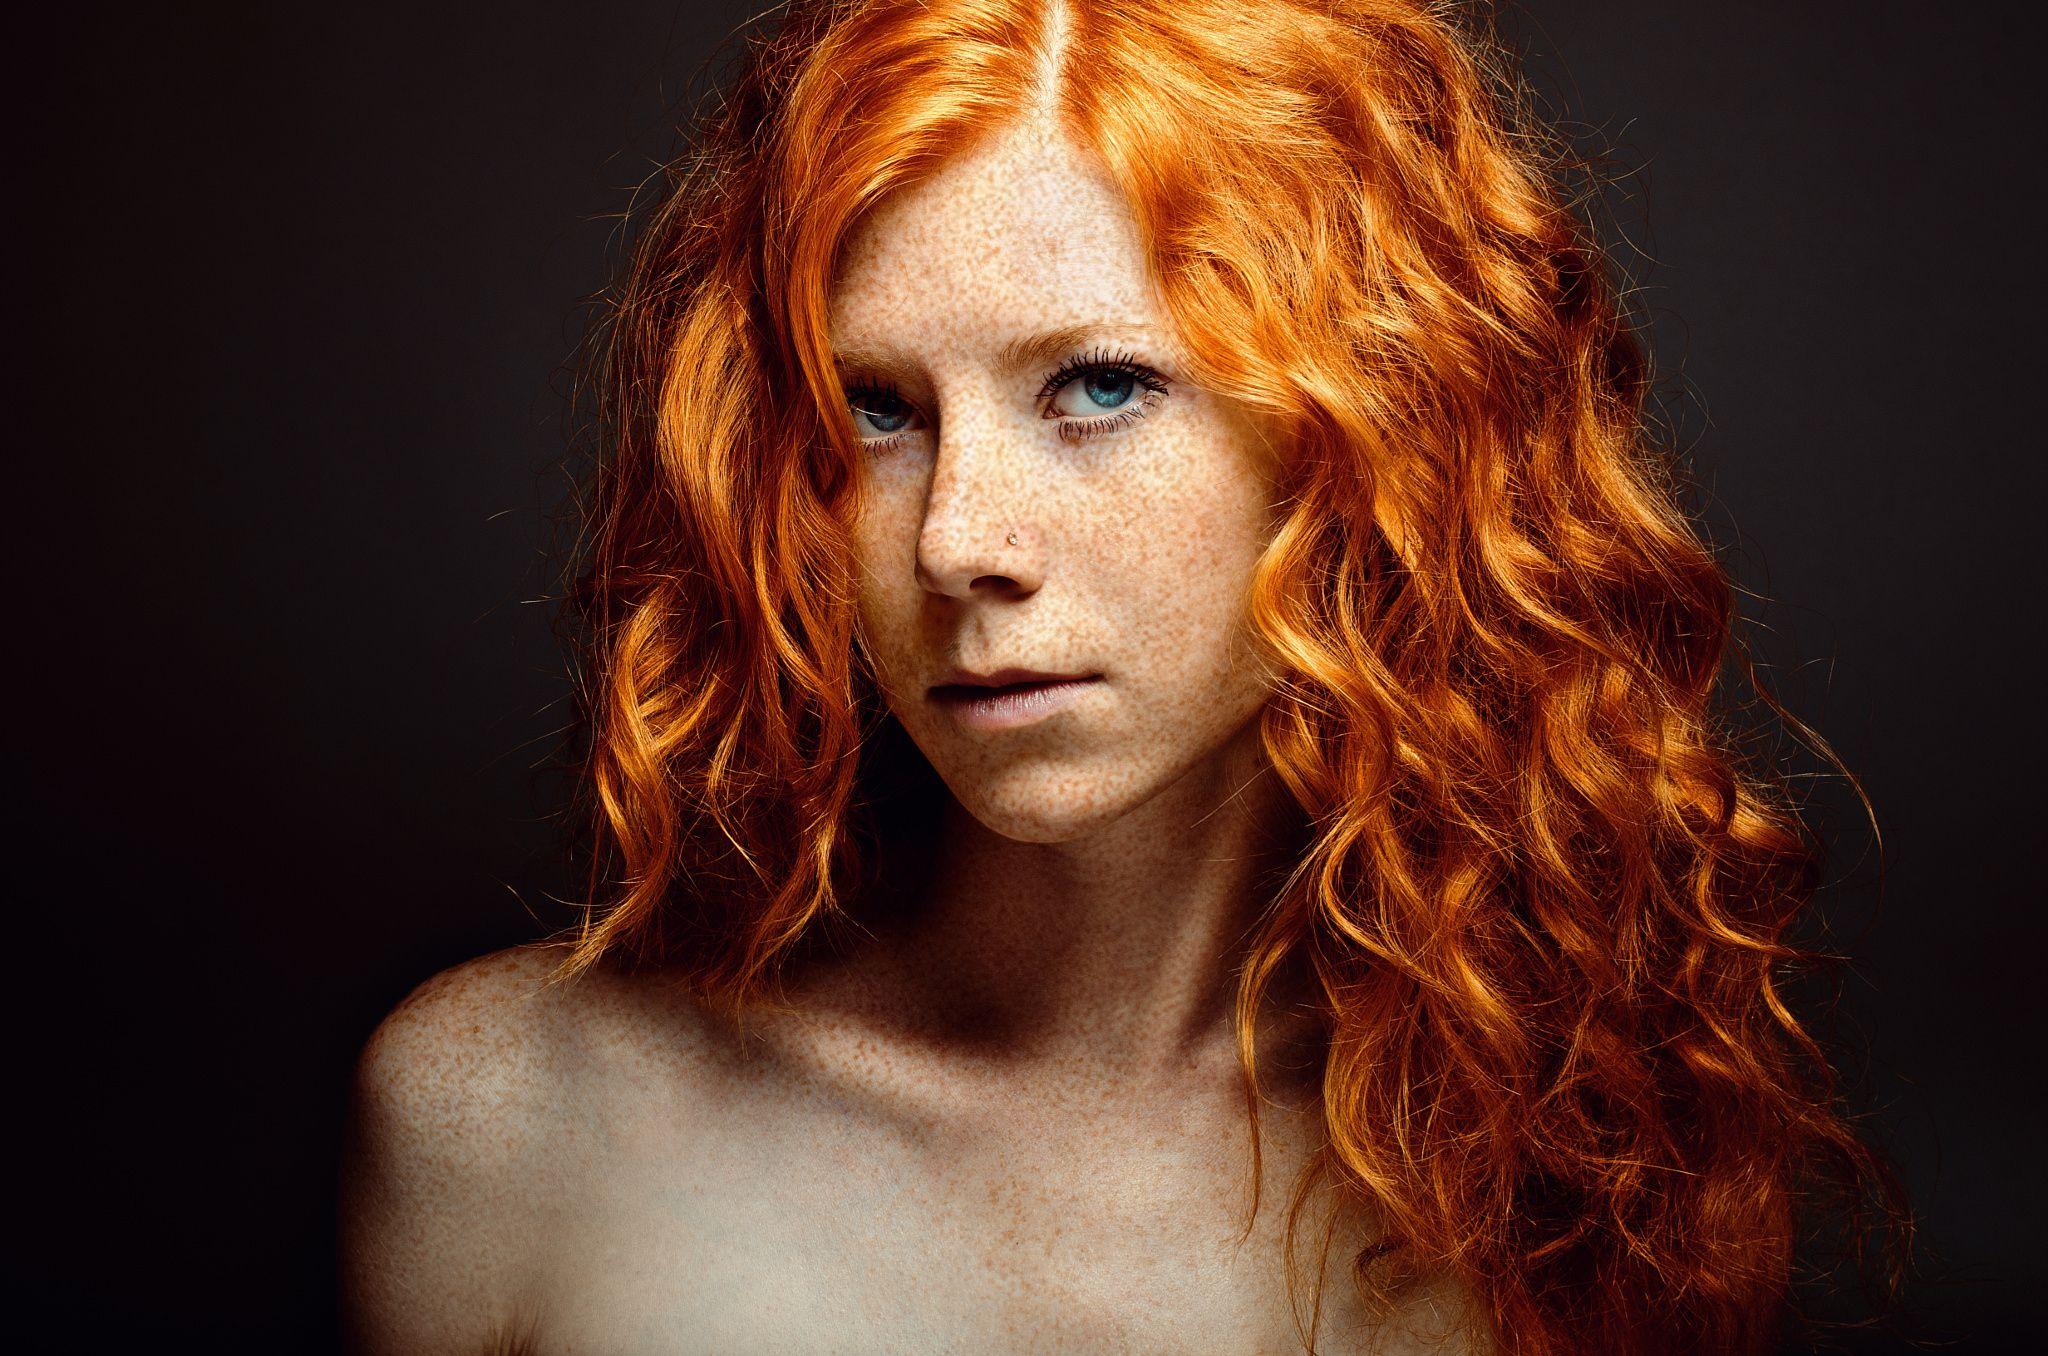 Red head by Sergey Gromov female models Pinterest